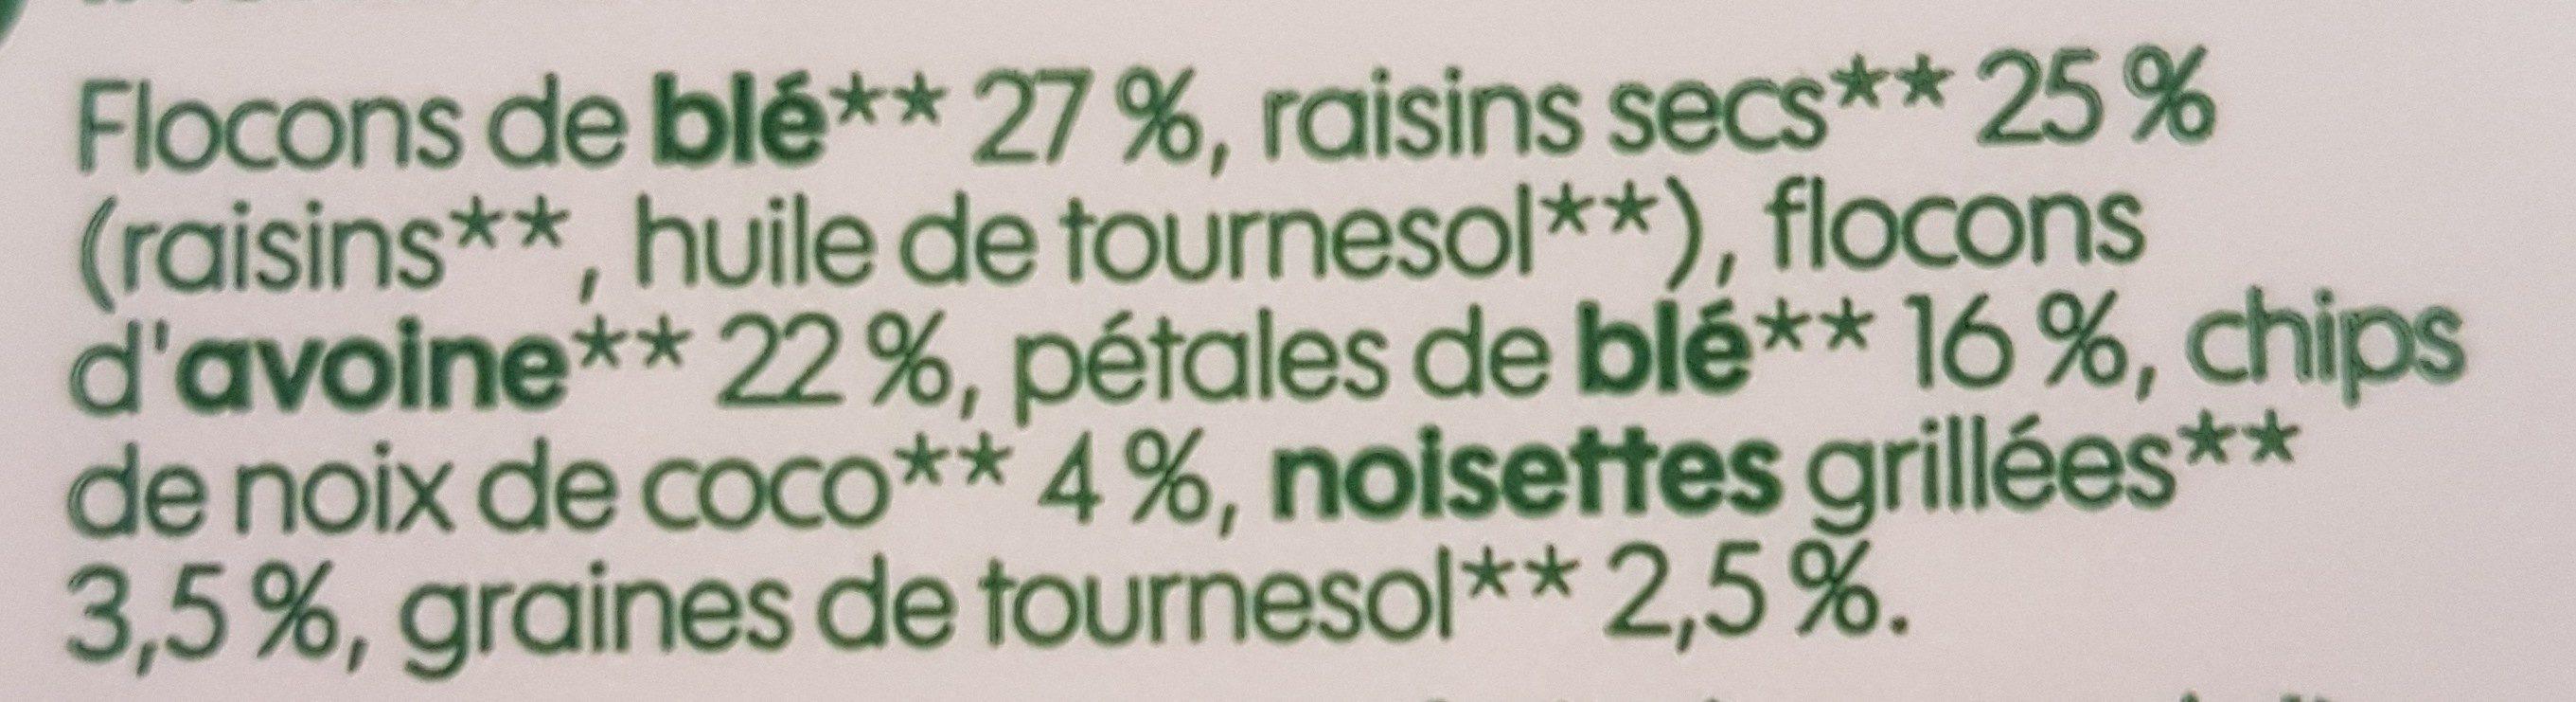 Muesli flocon fruits secs - kg - Ingredients